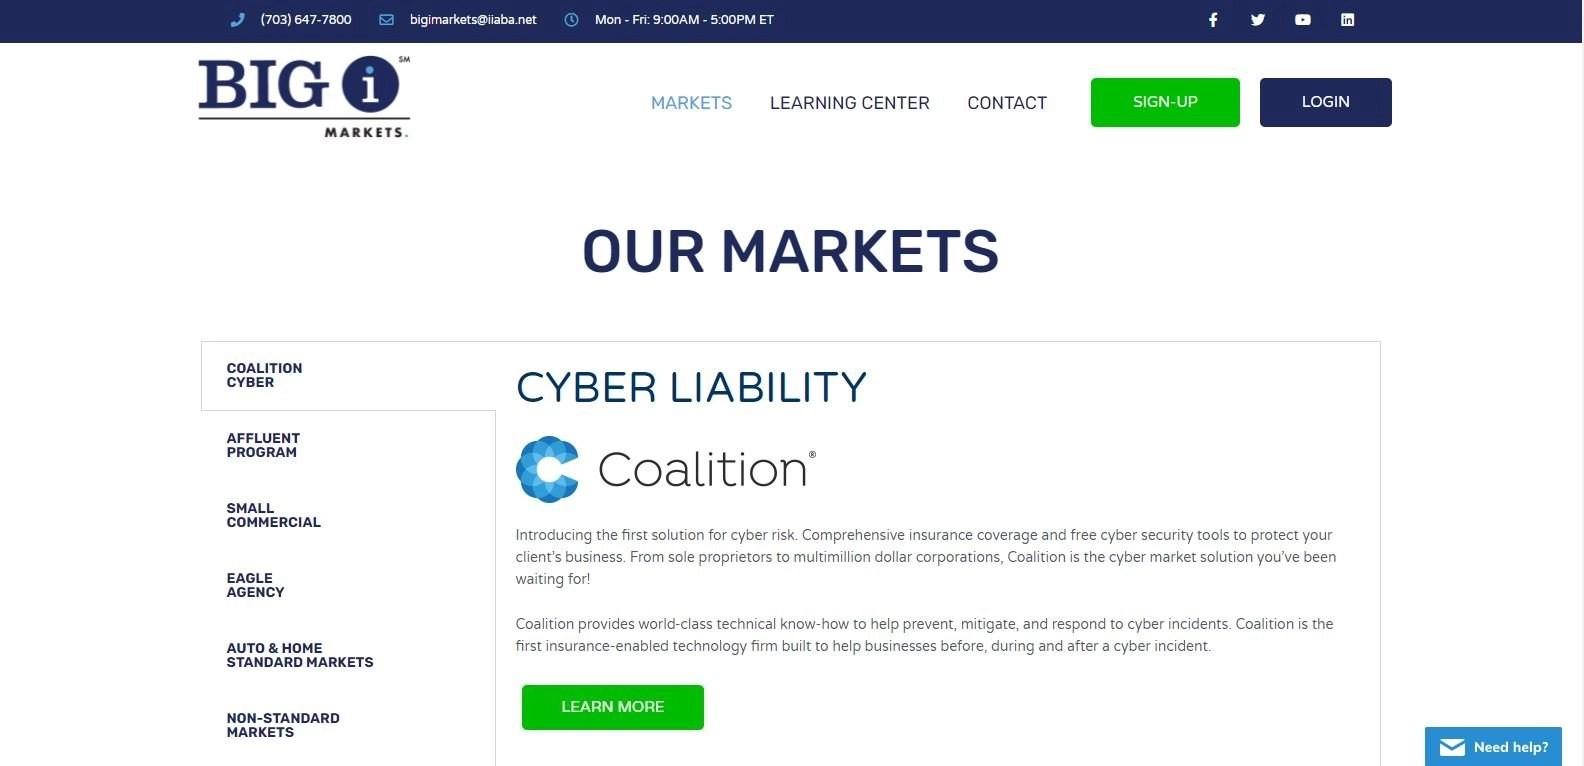 bim-markets-coalition-thumb